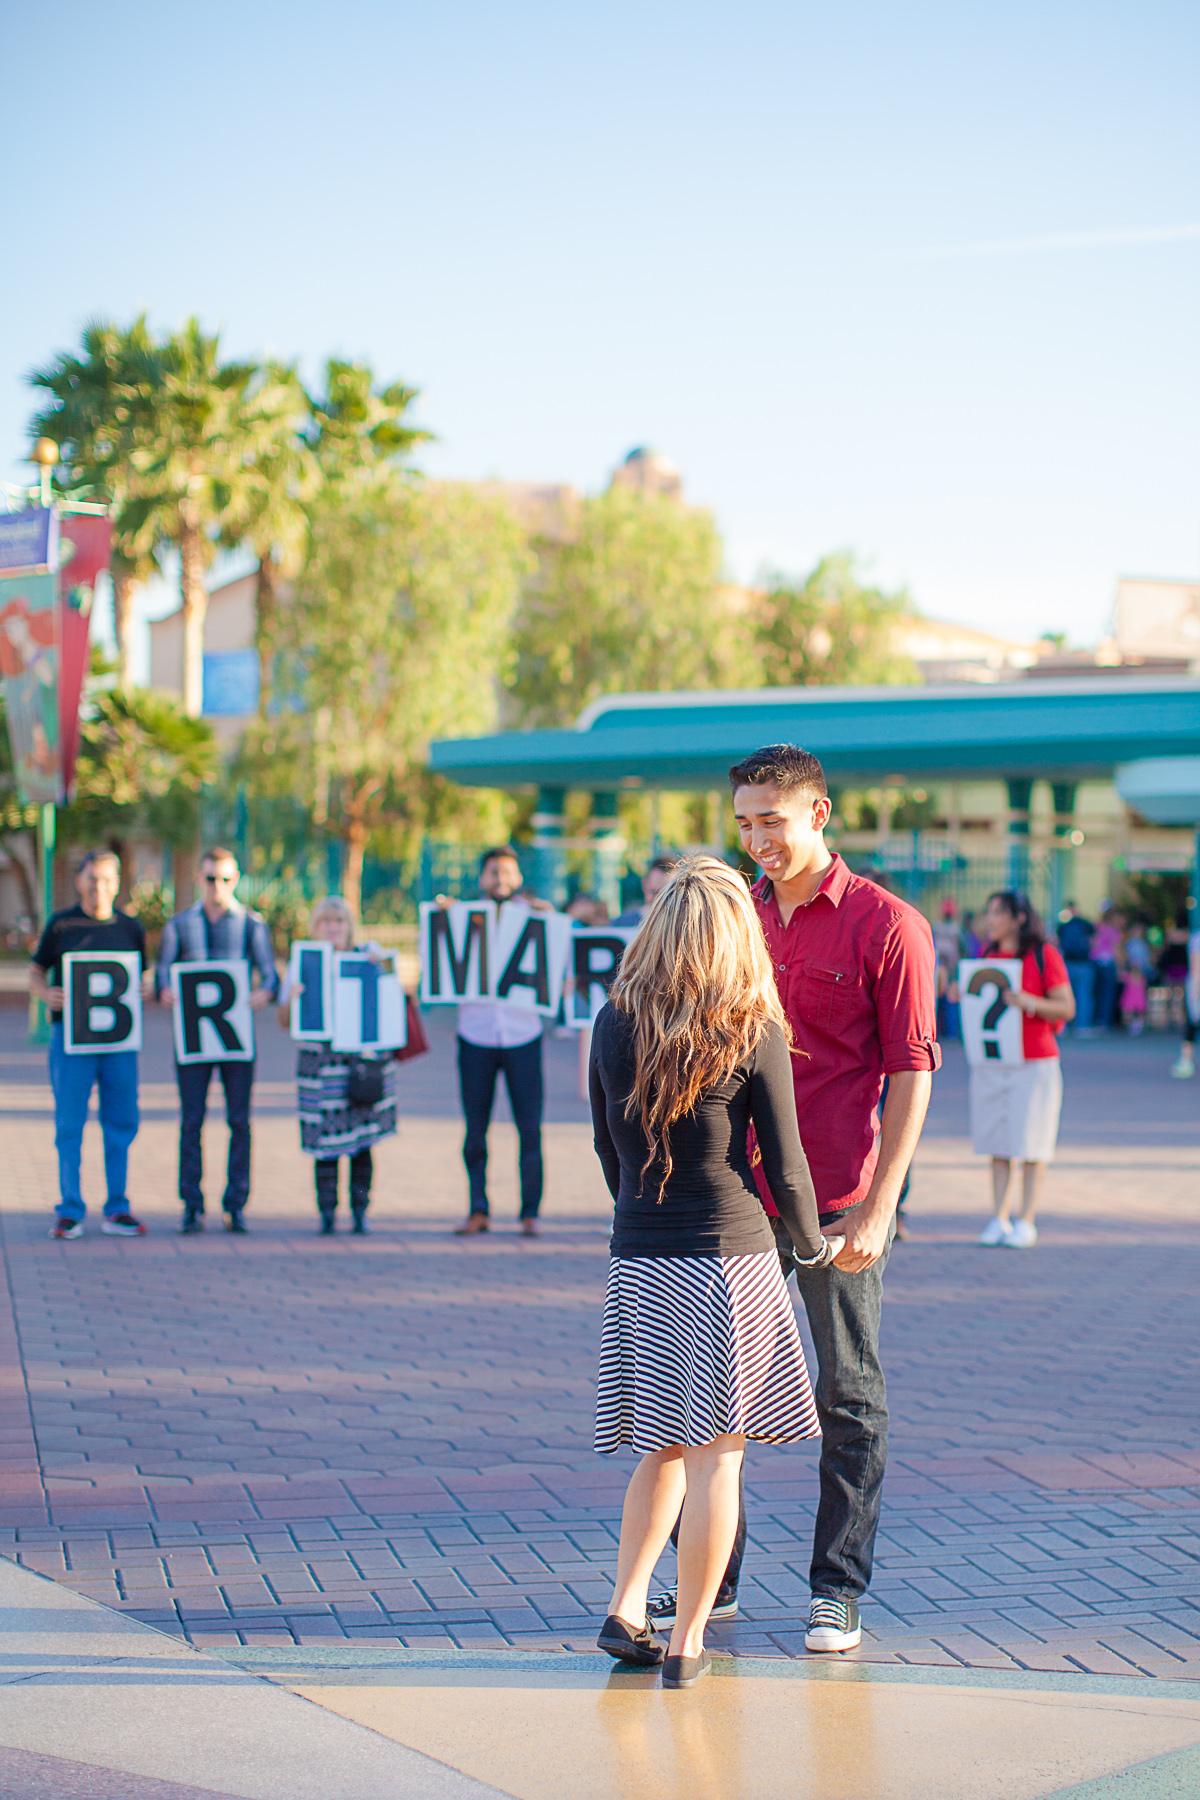 Image 5 of Magical Disneyland Proposal